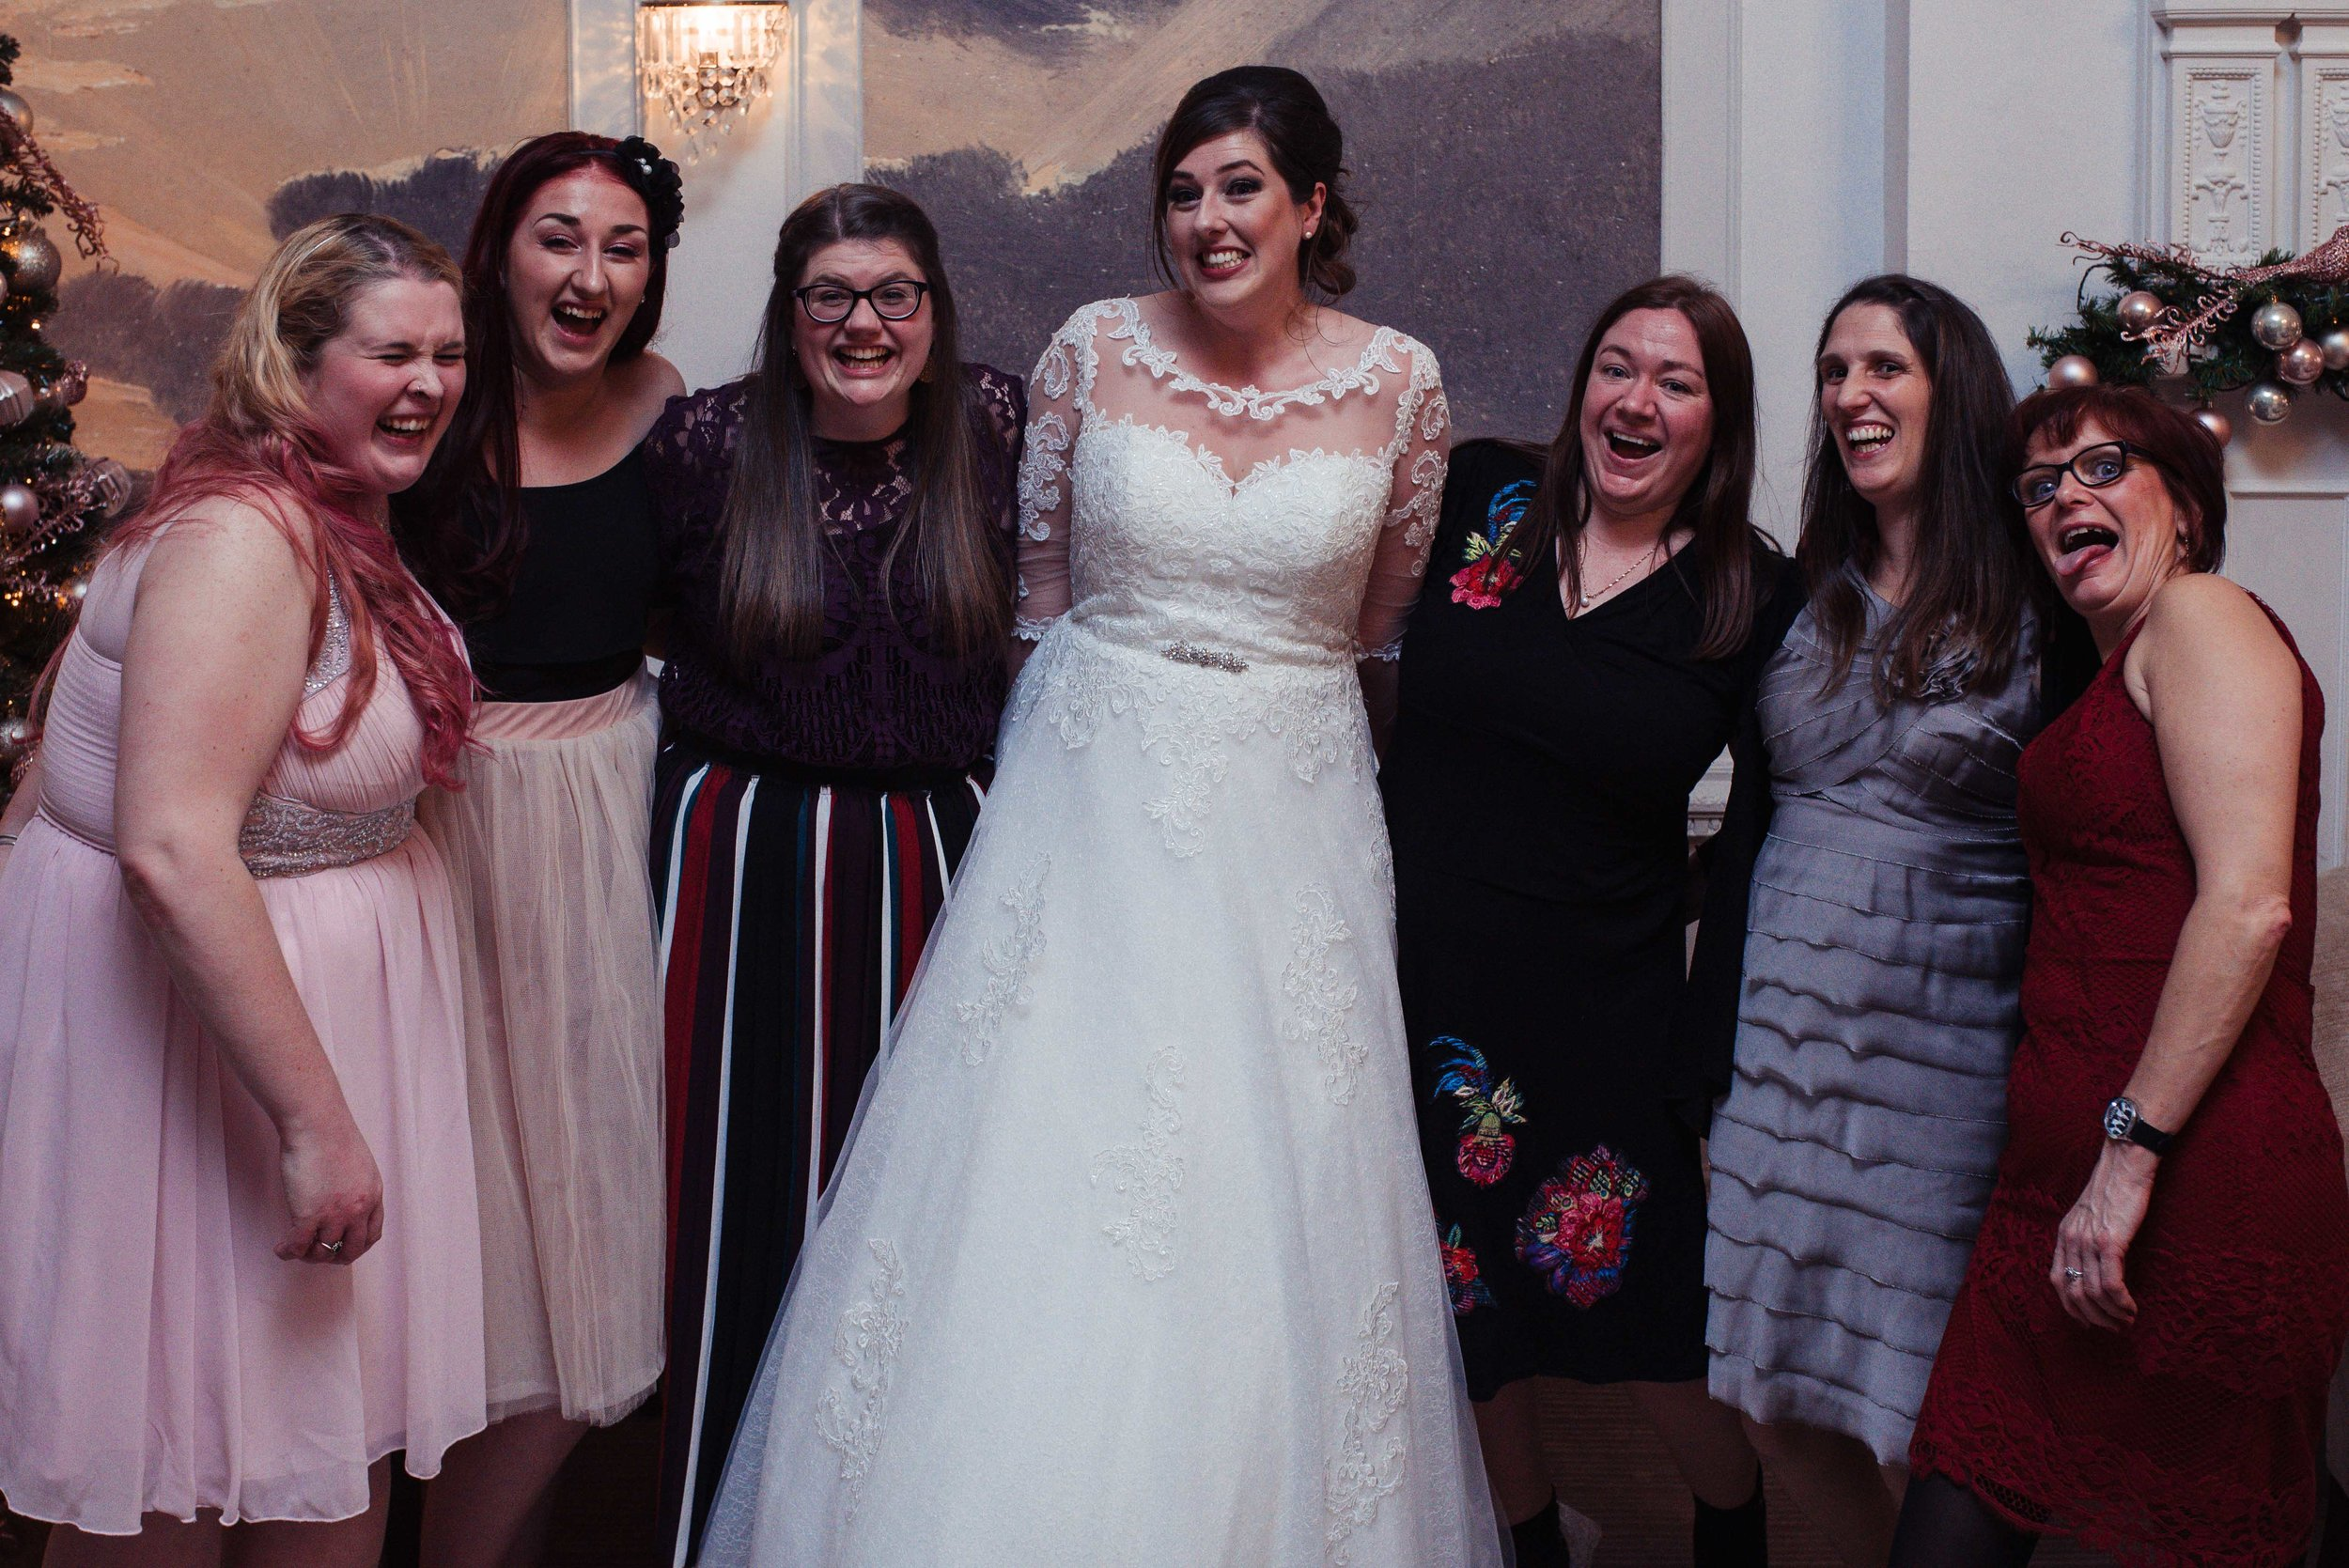 Belsfield-wedding-photography-44.jpg